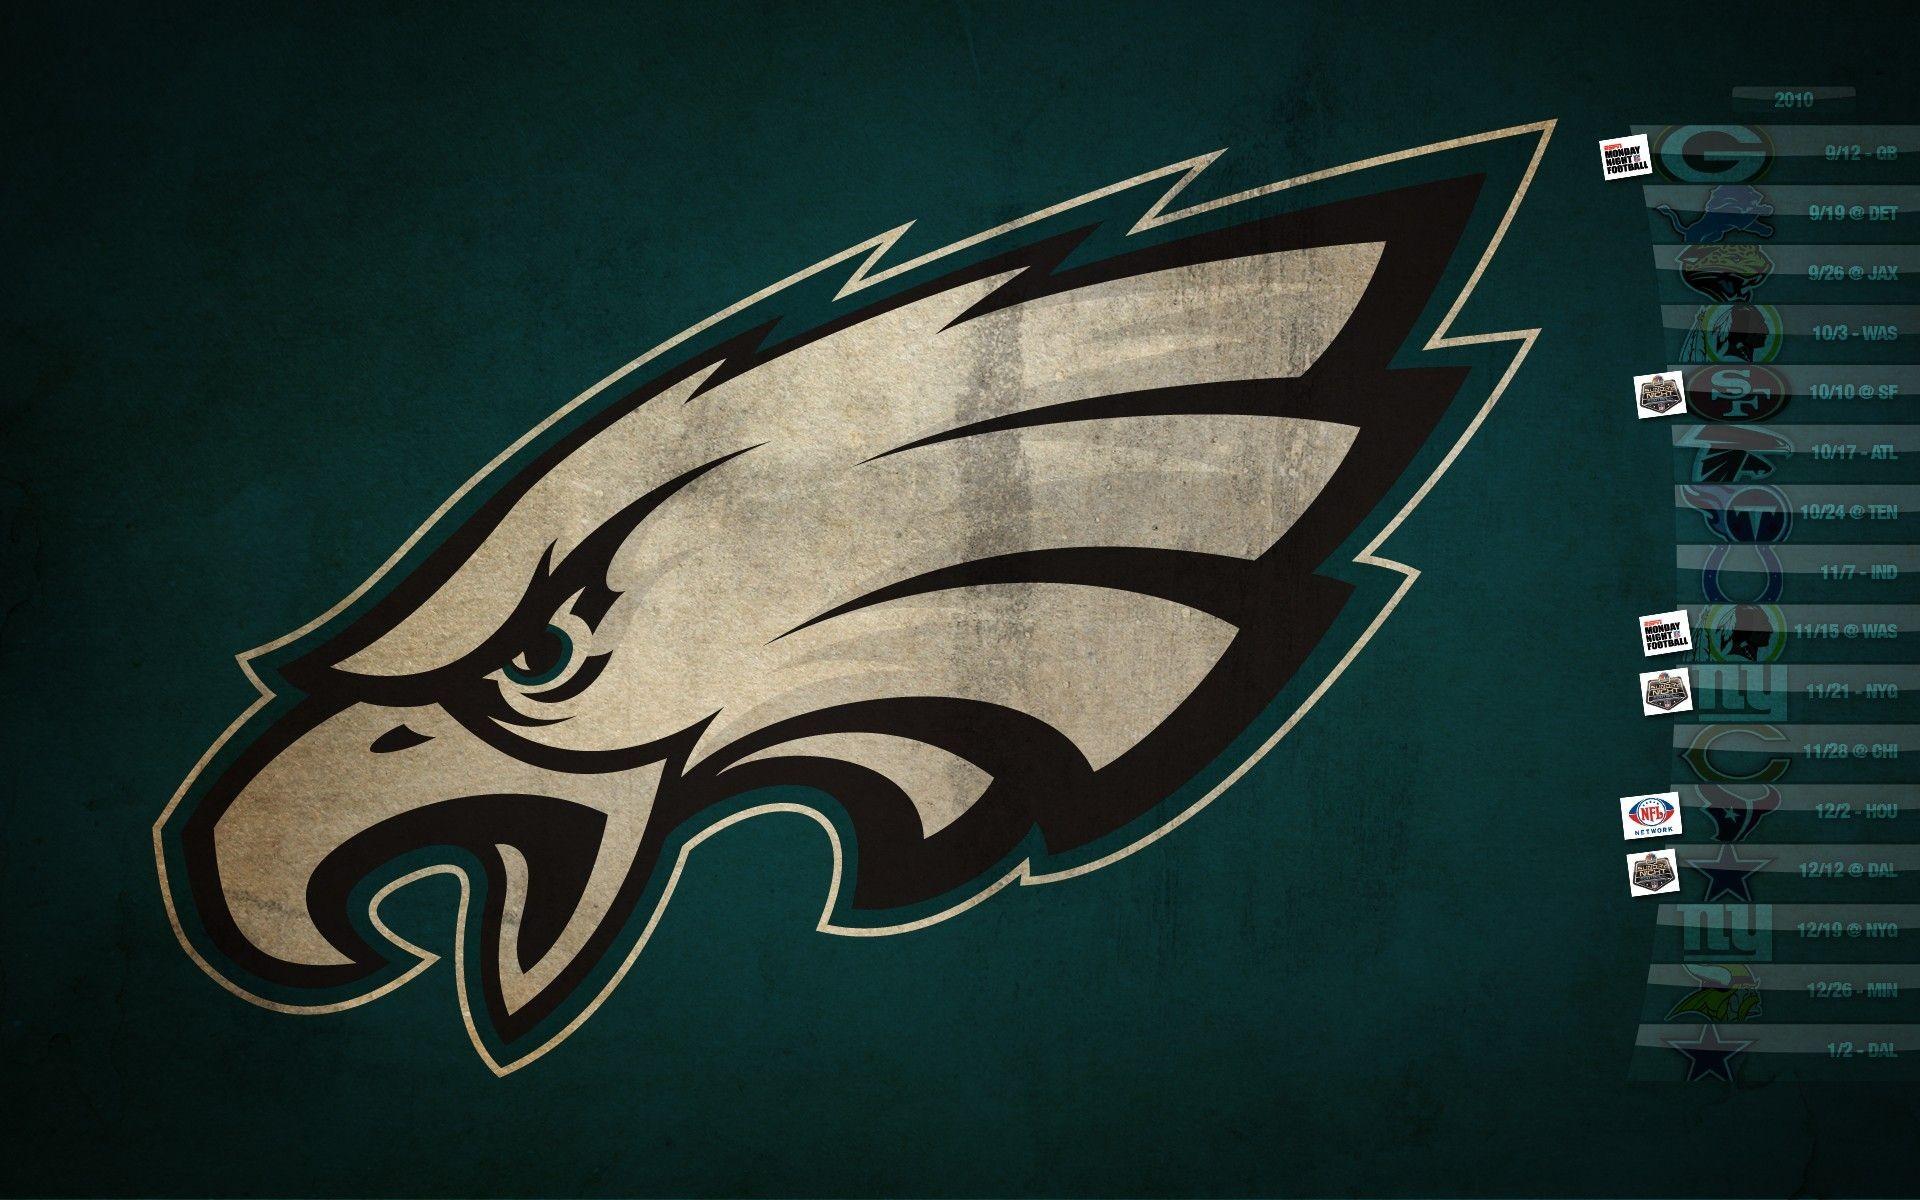 Philadelphia Eagles Wallpaper ·① Download Free Amazing HD